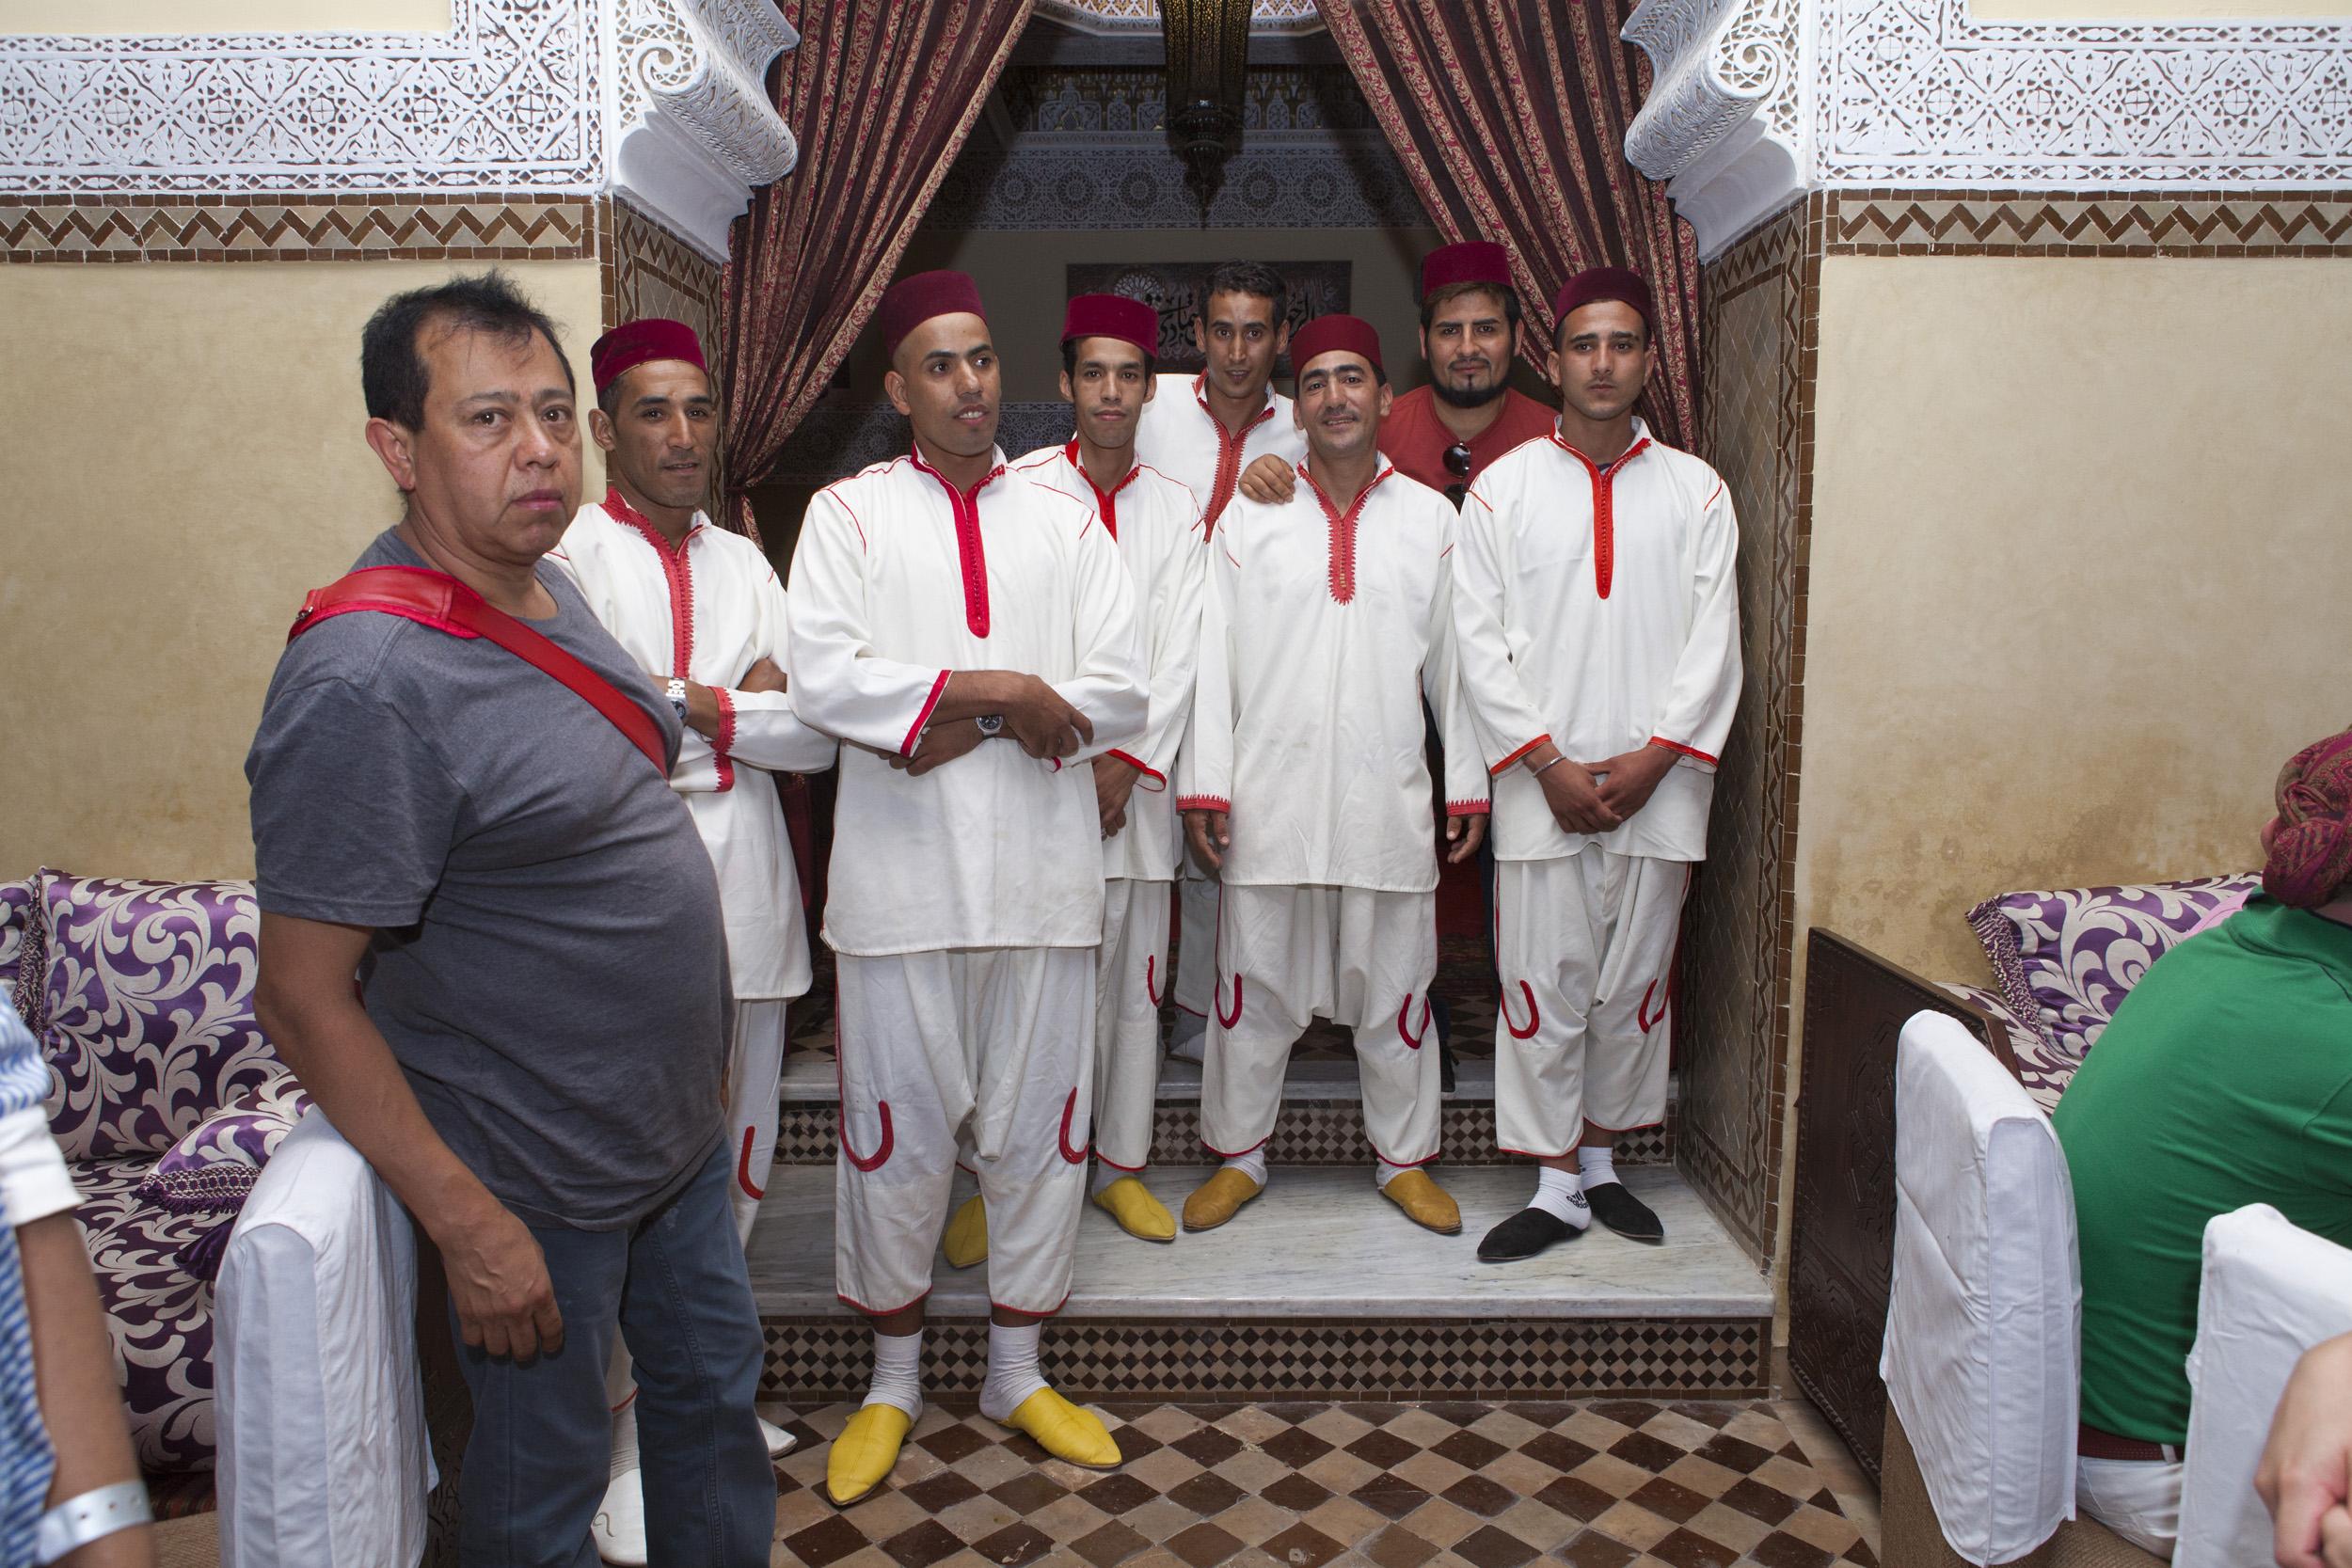 marrakech_2_convencion_anual_salerm_cosmetics_proline_12